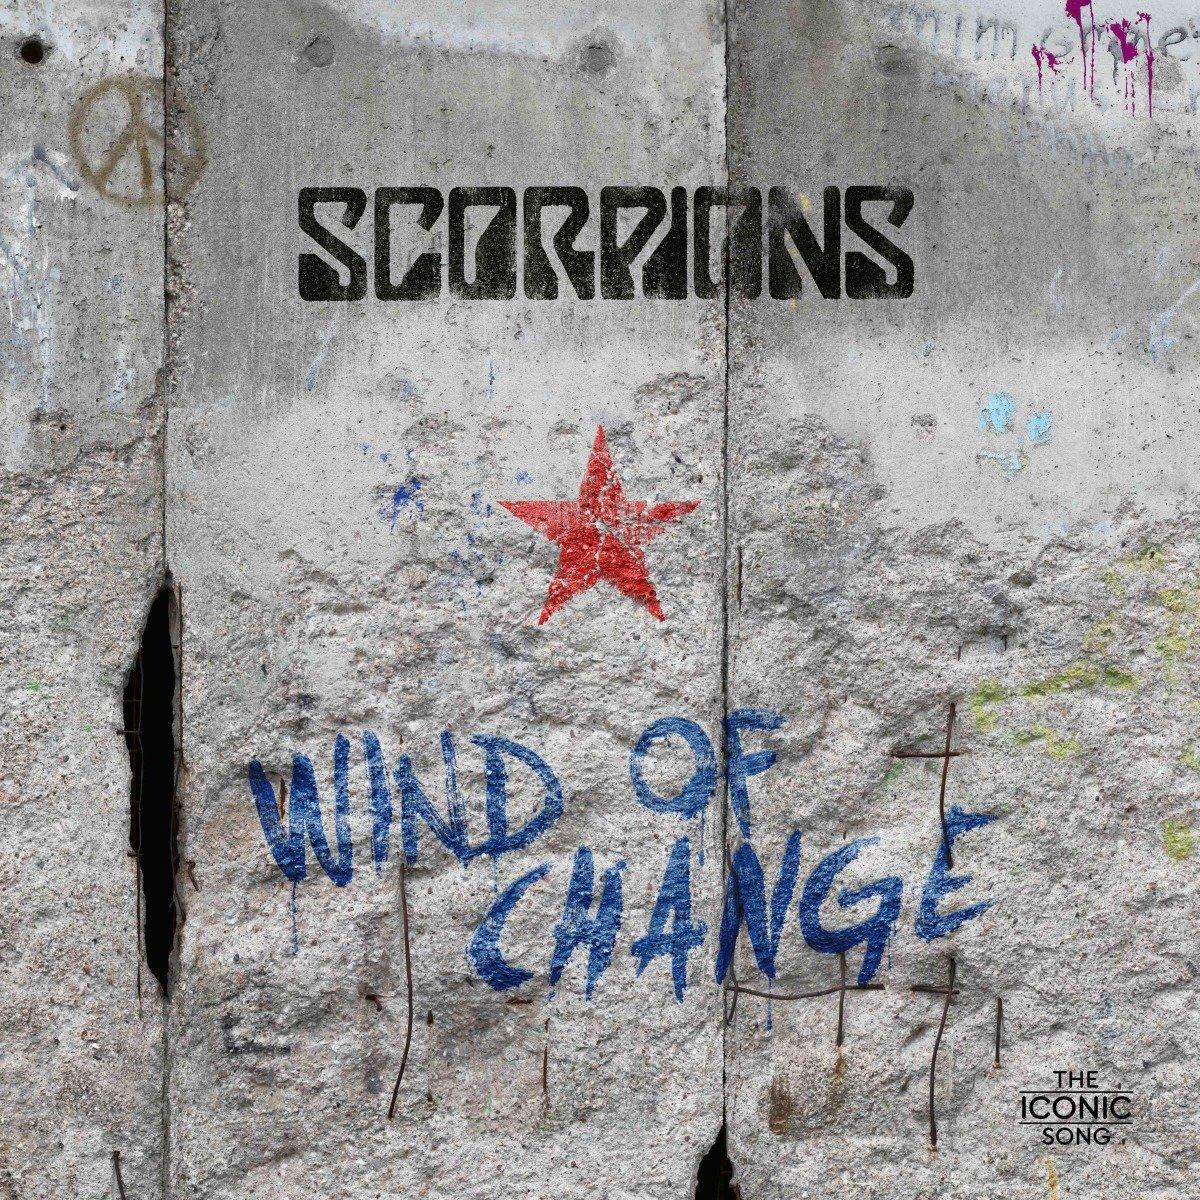 492615_Box_Cover_2D_Scorpions_WoC_low